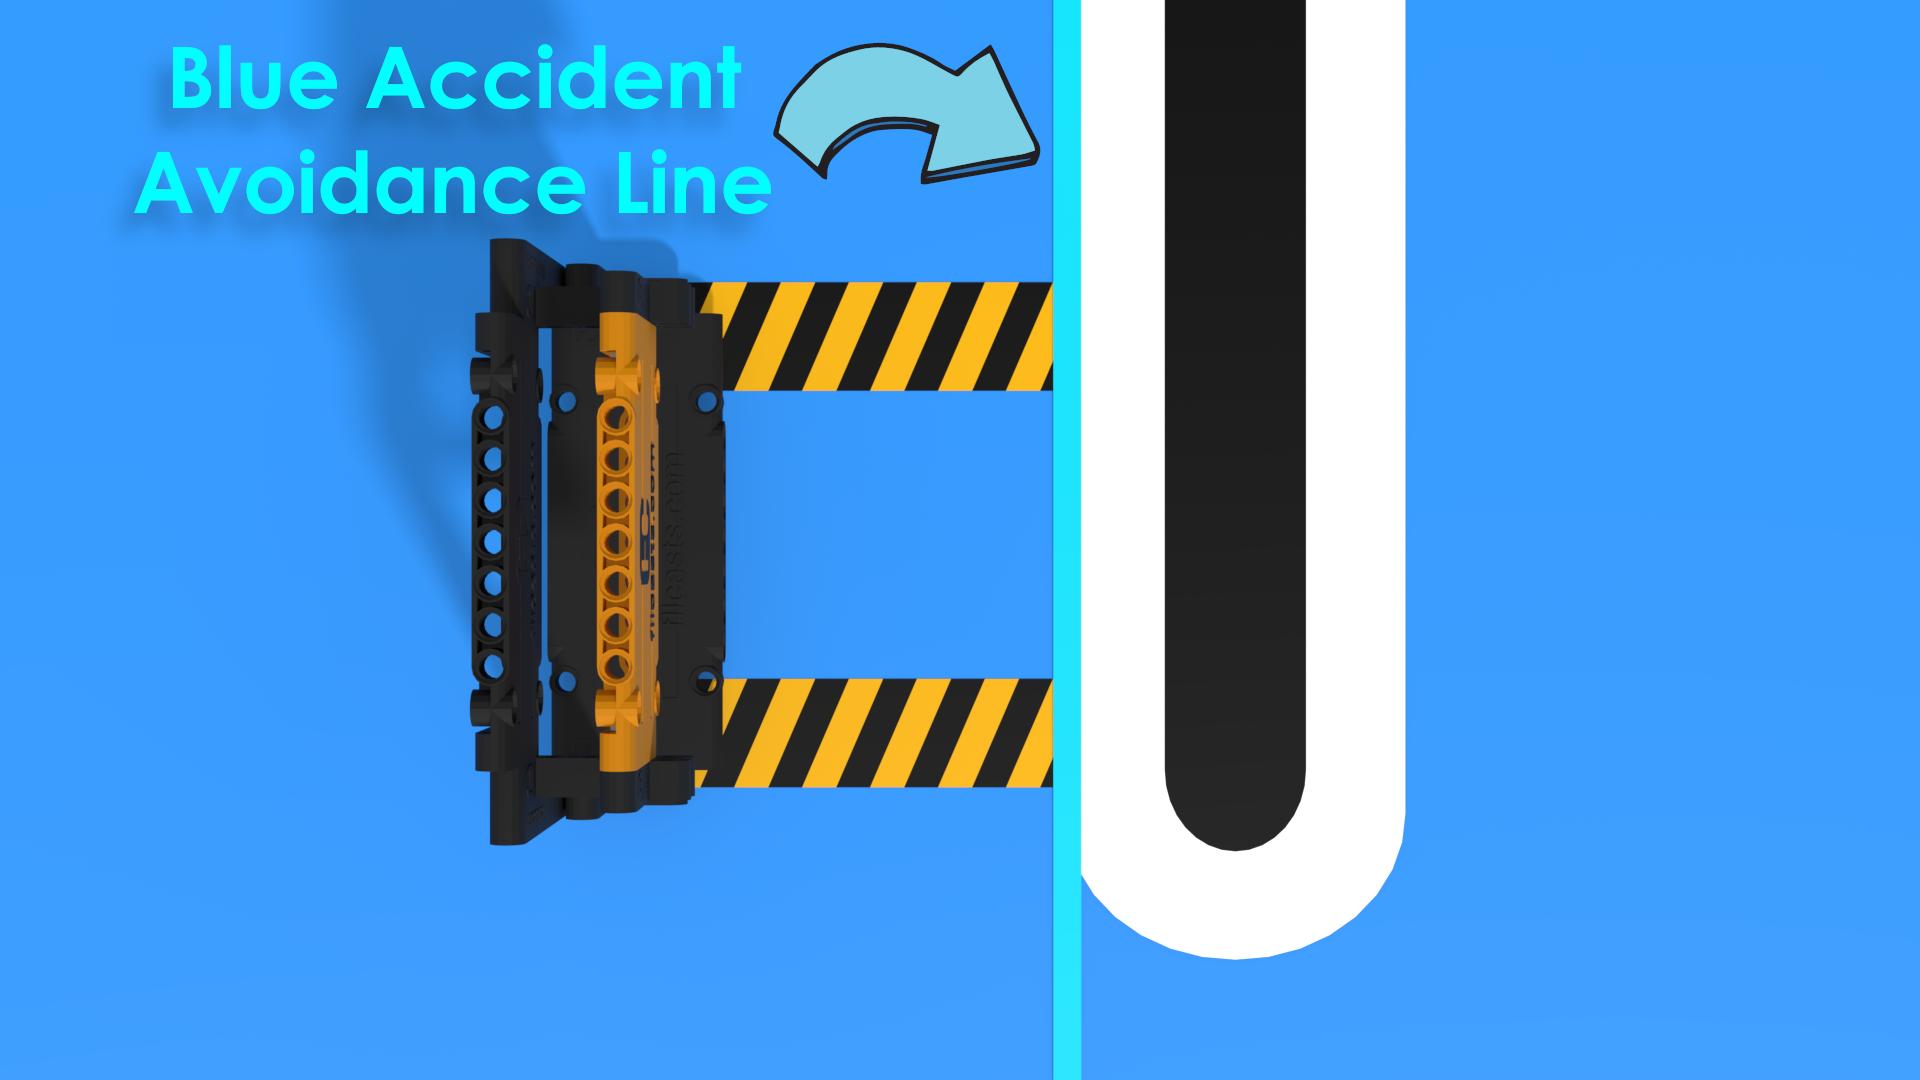 Accident Avoidance Line